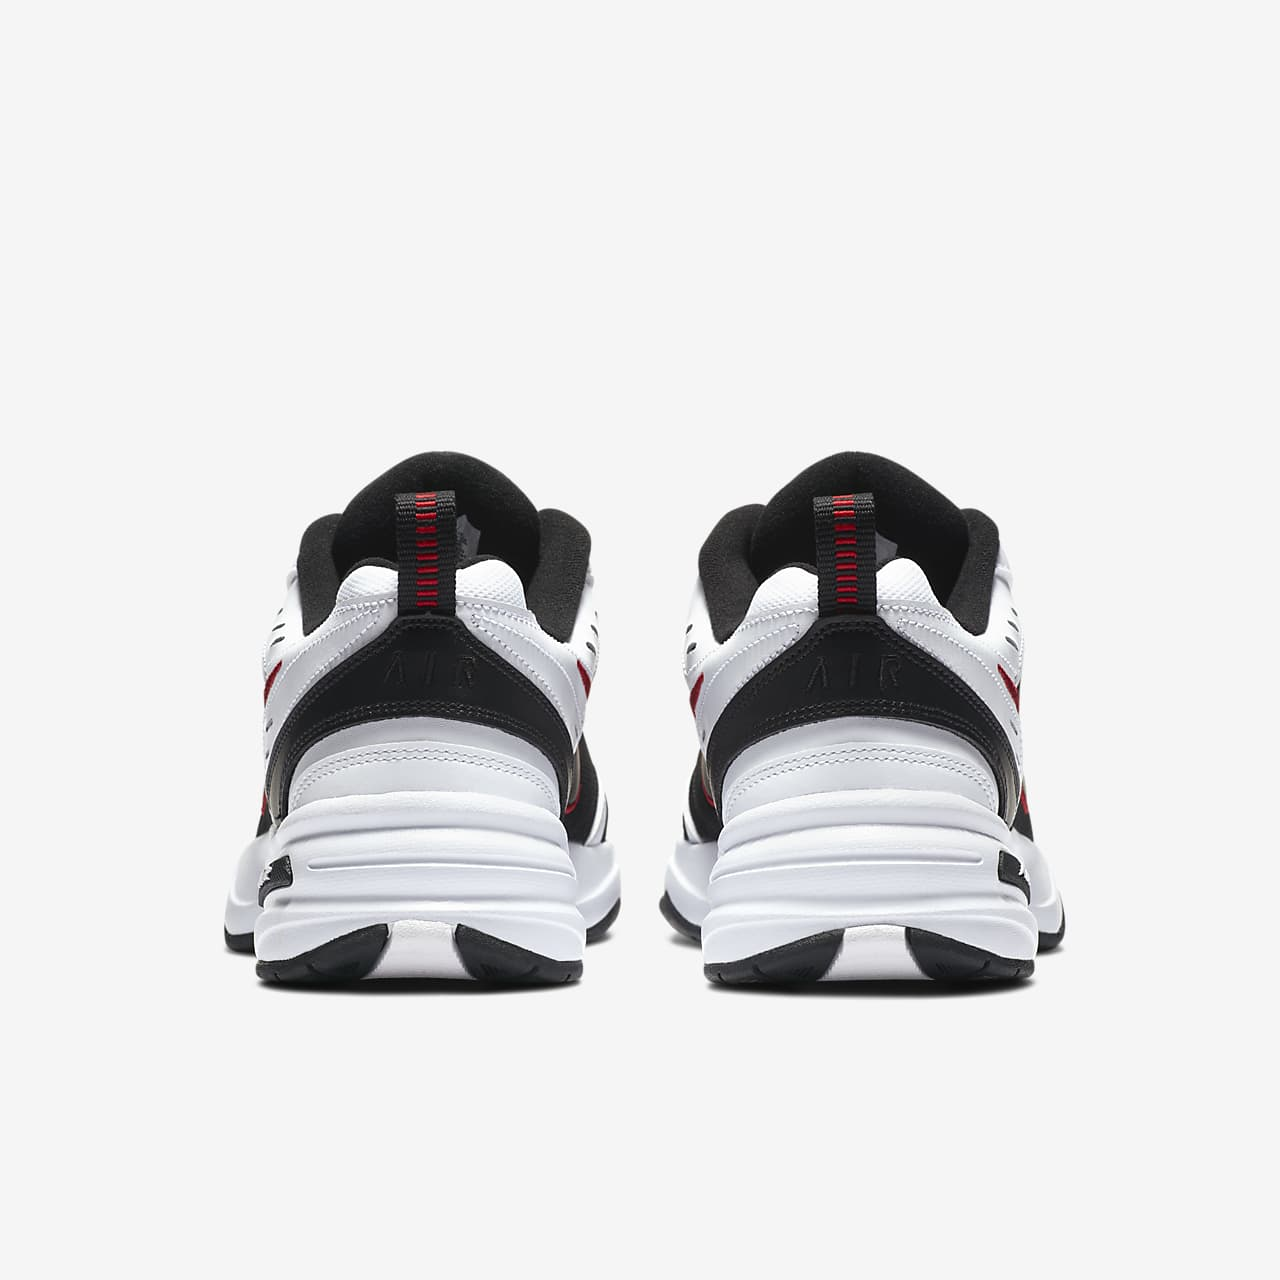 Cipő NIKE Air Monarch Iv 415445 101 WhiteBlack Sneakers